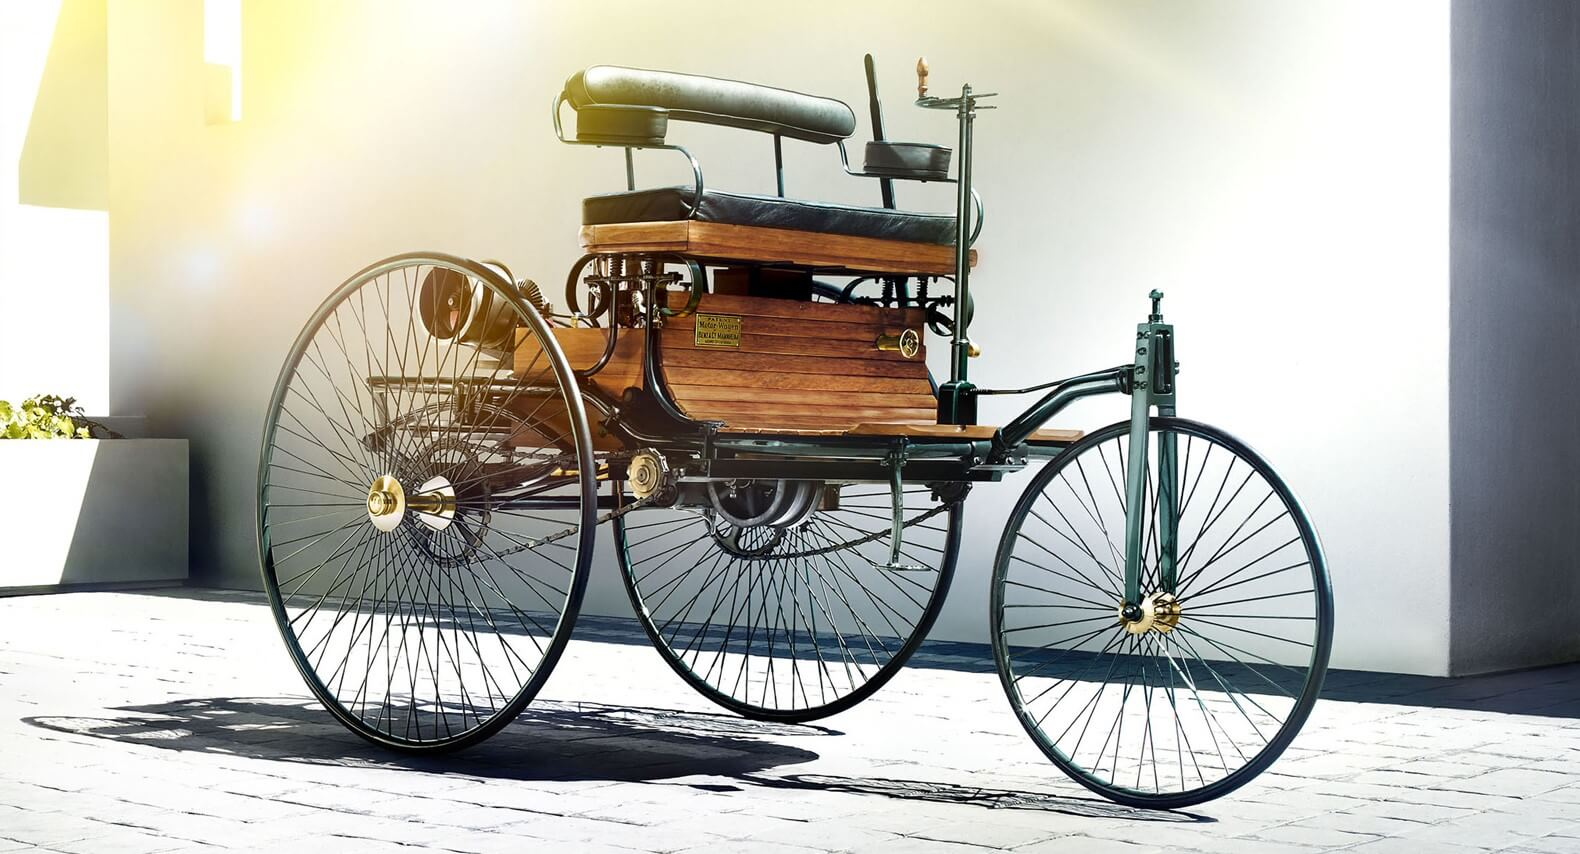 Primer vehículo mundo